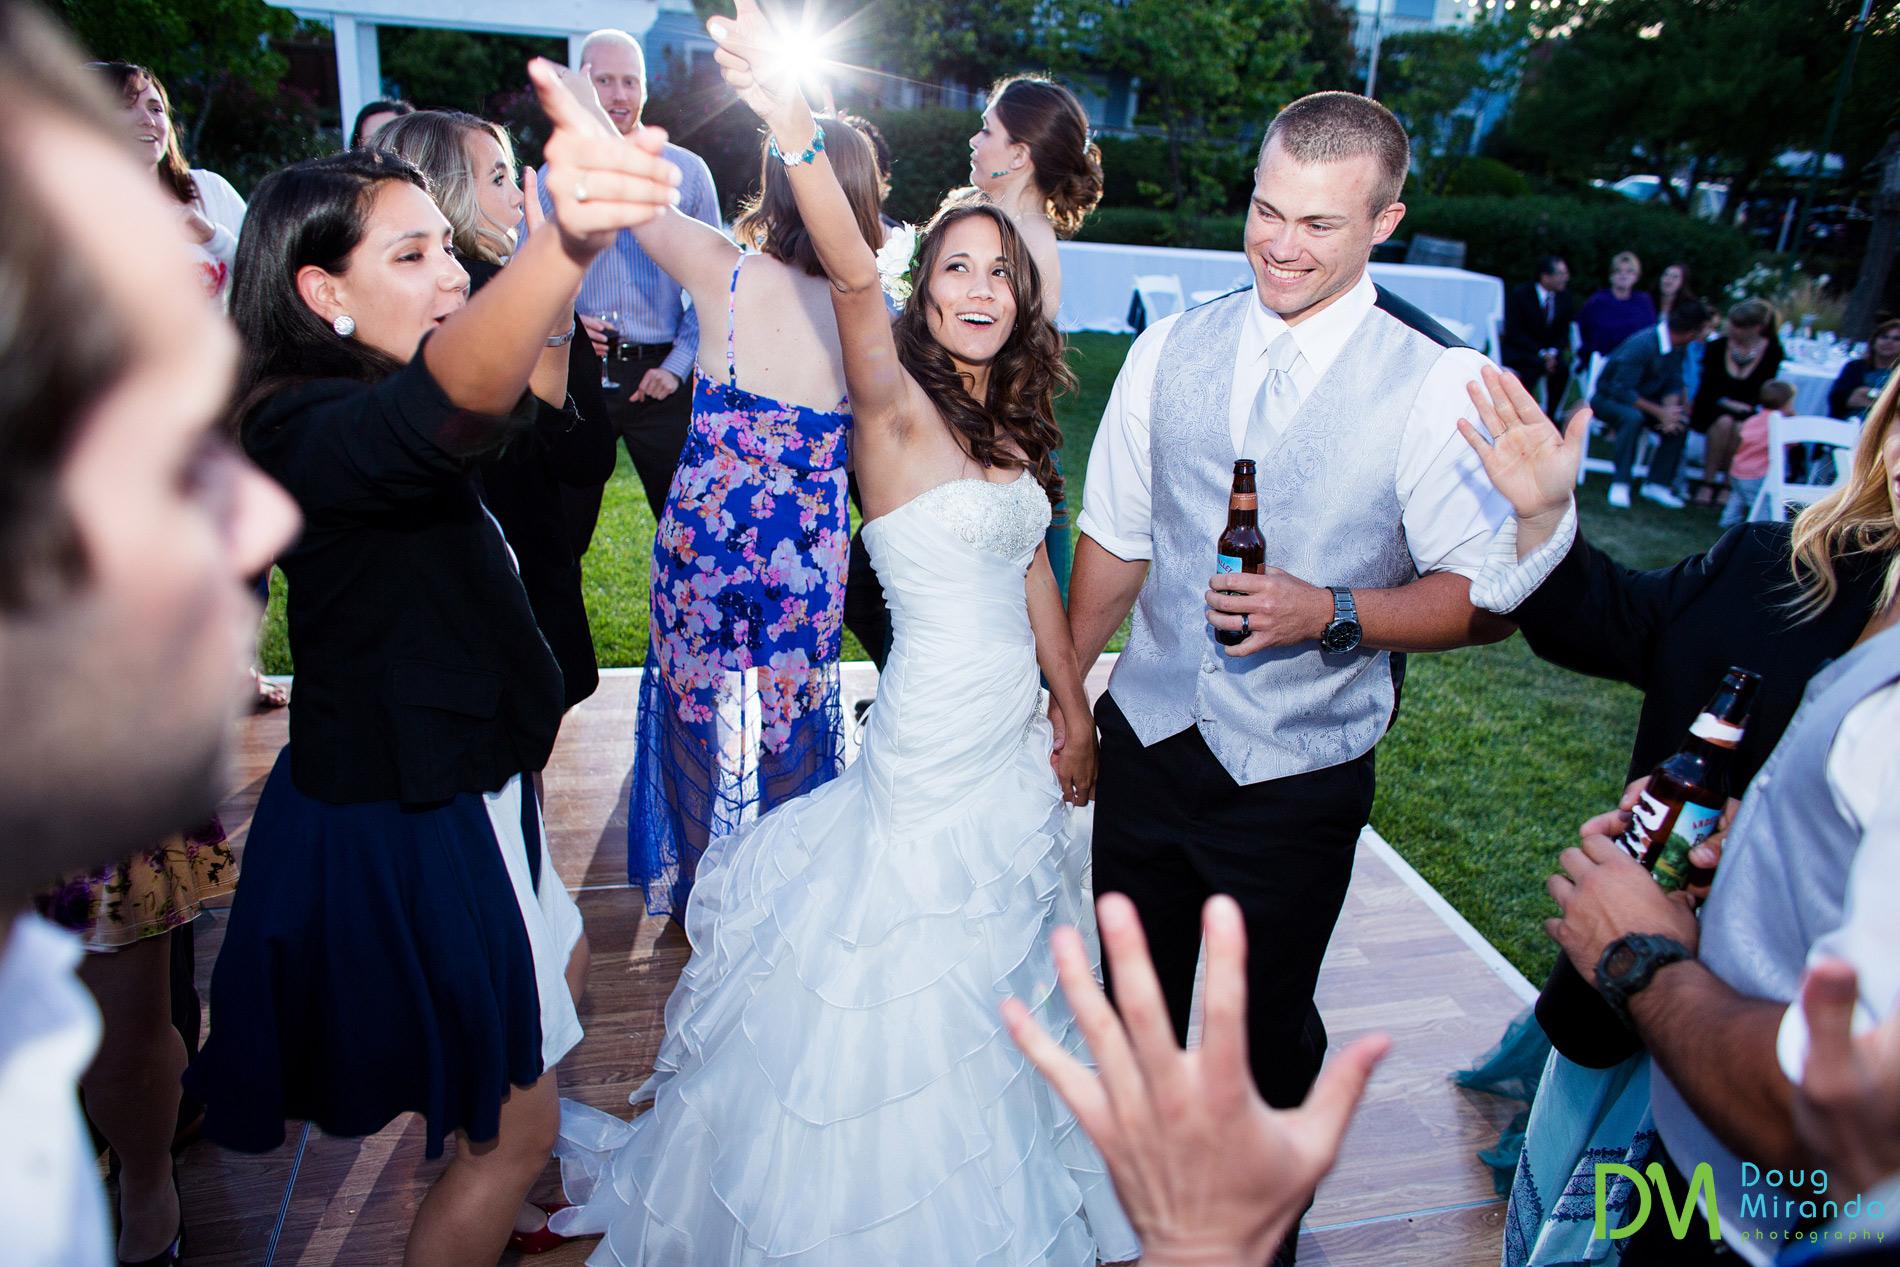 Dancing the night away at their Geyserville Inn wedding reception.